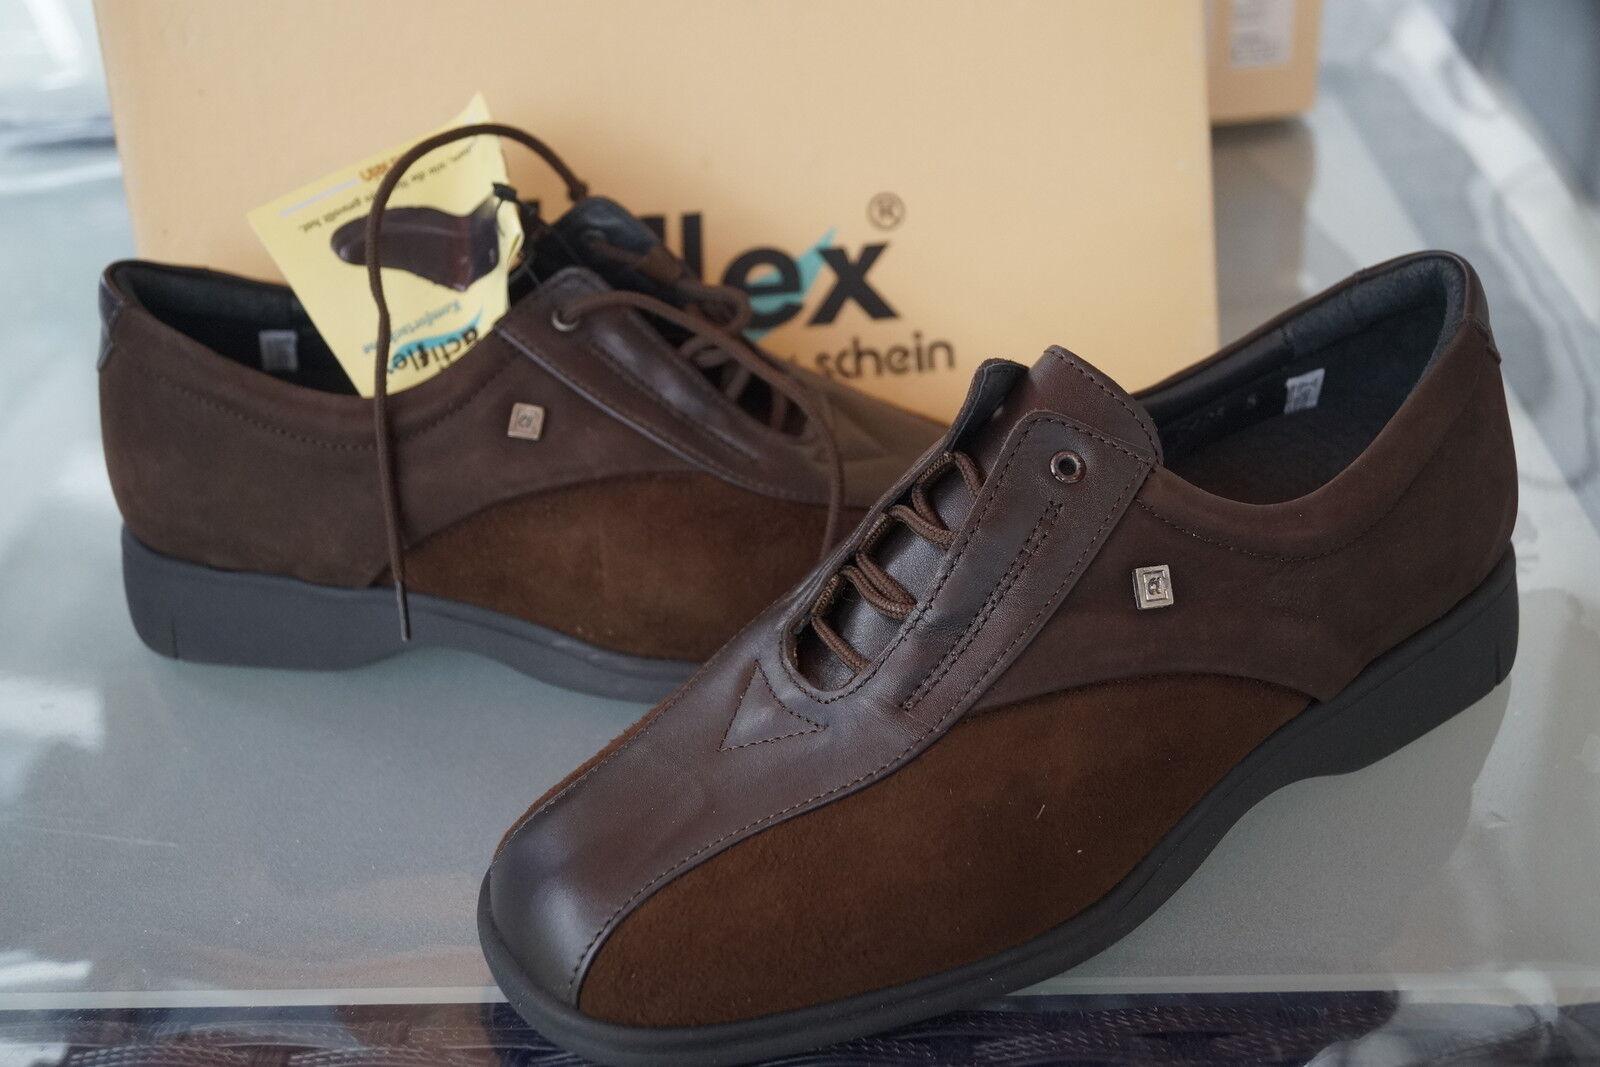 Actiflex Damen Comfort Schuhe Wohlfühlschuhe Leder braun mit